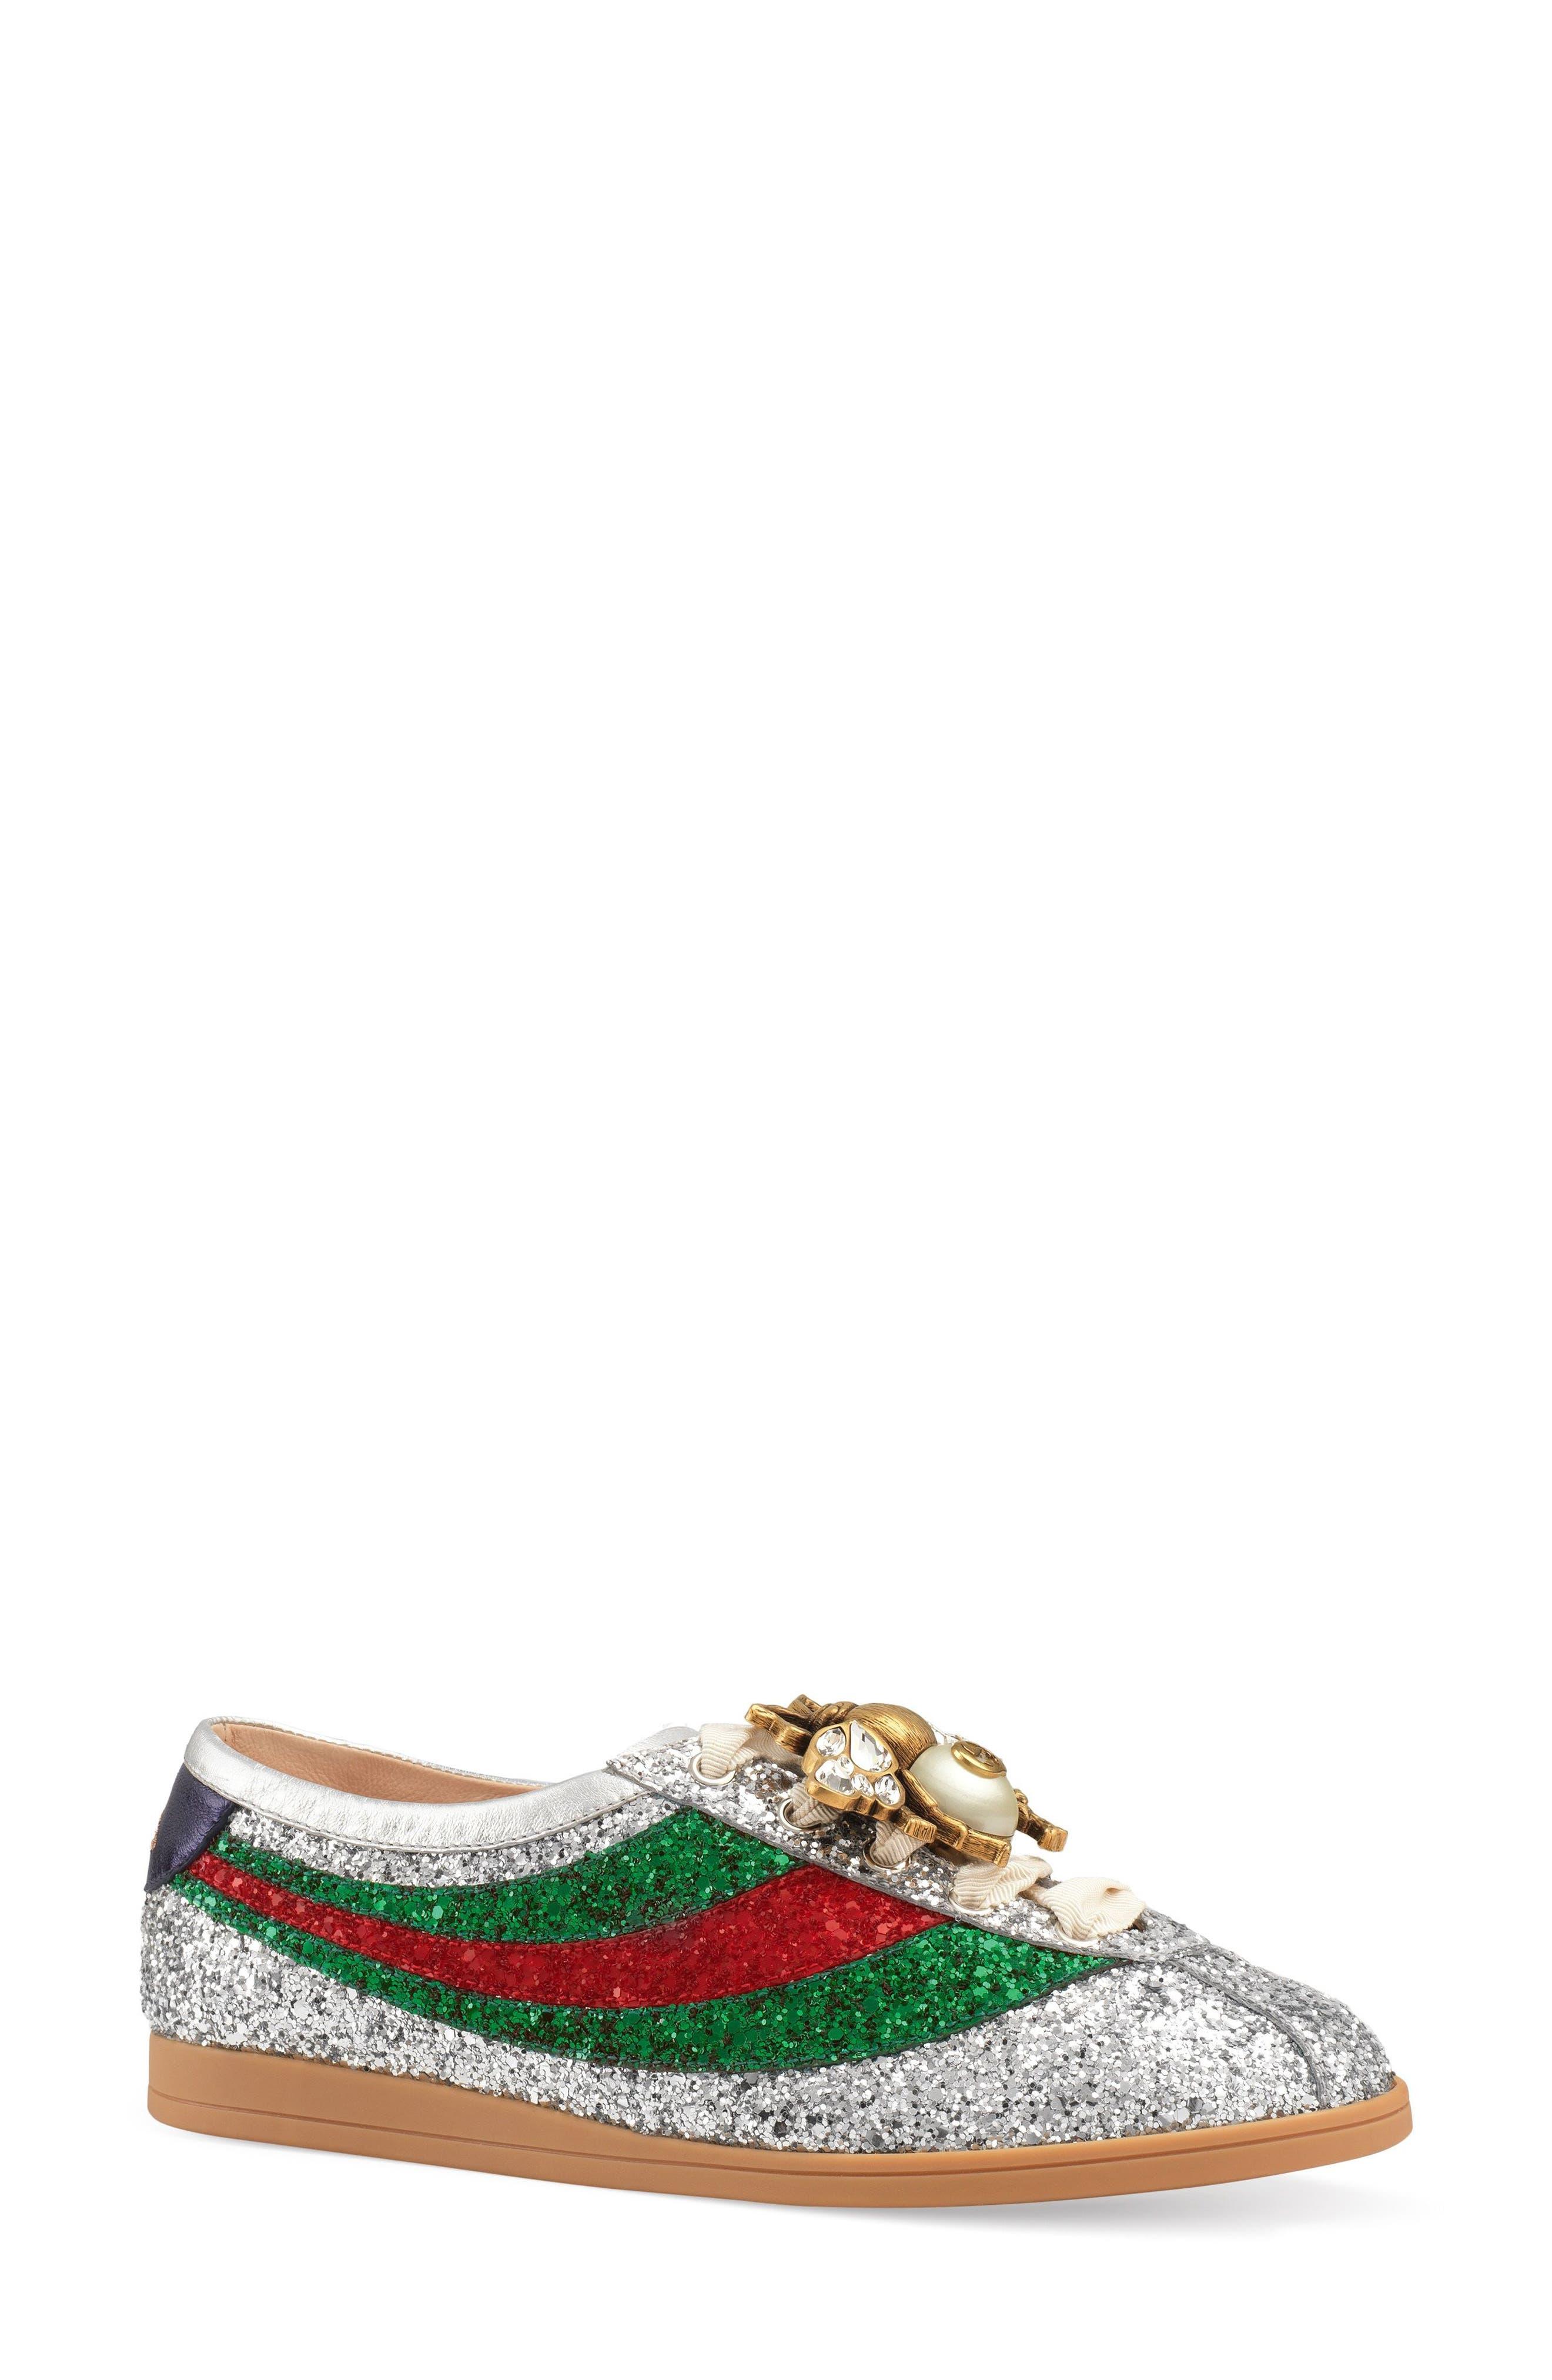 Alternate Image 1 Selected - Gucci Falacer Glitter Sneaker (Women)